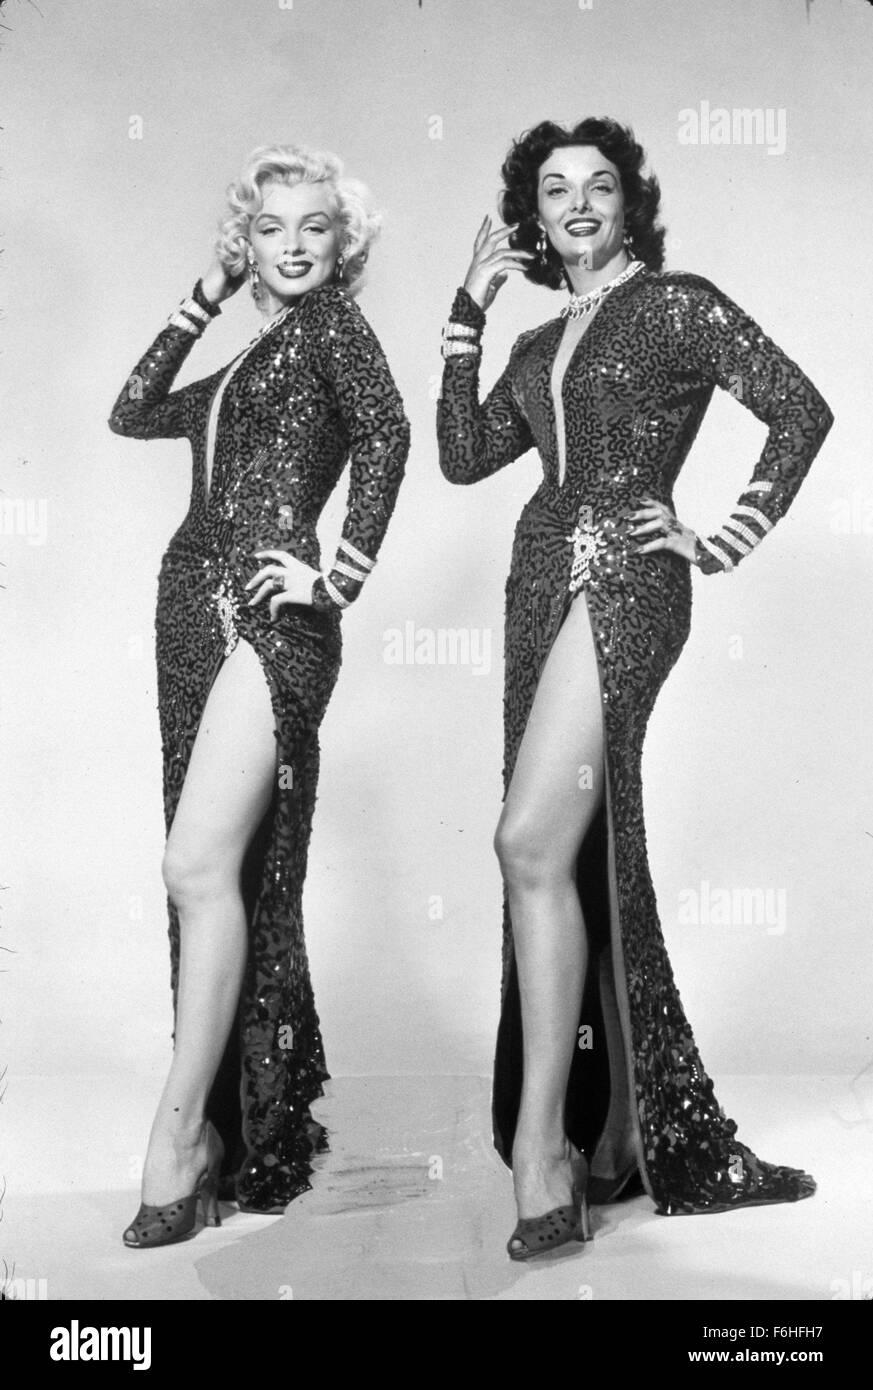 1953, Film Title: GENTLEMEN PREFER BLONDES, Director: HOWARD HAWKS, Studio: FOX, Pictured: FULL LENGTH, MARILYN - Stock Image